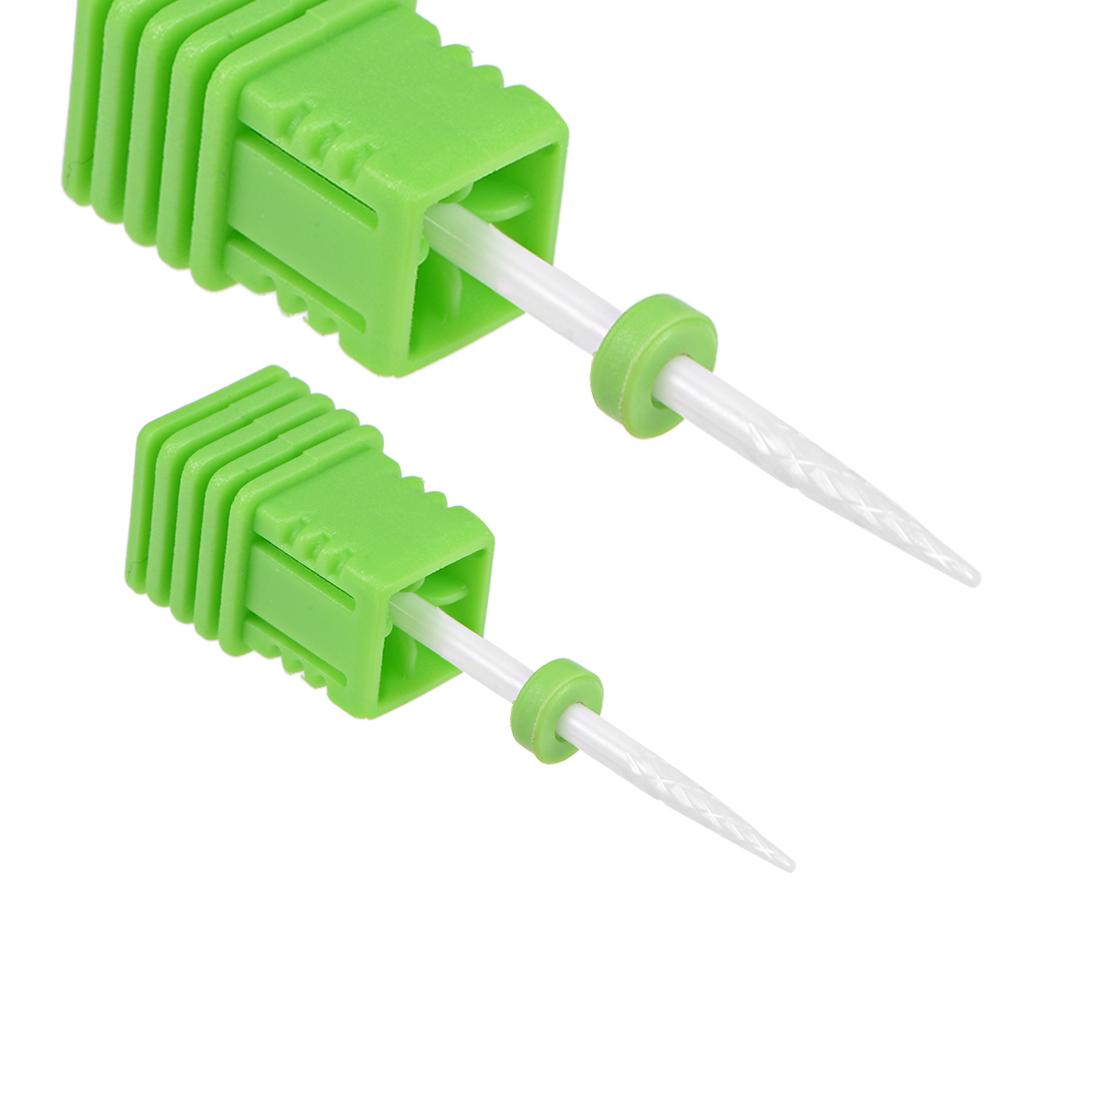 2pcs Ceramic Nail Drill Bits 3/32 inch (Coarse Grit) Polish Nails Cuticle